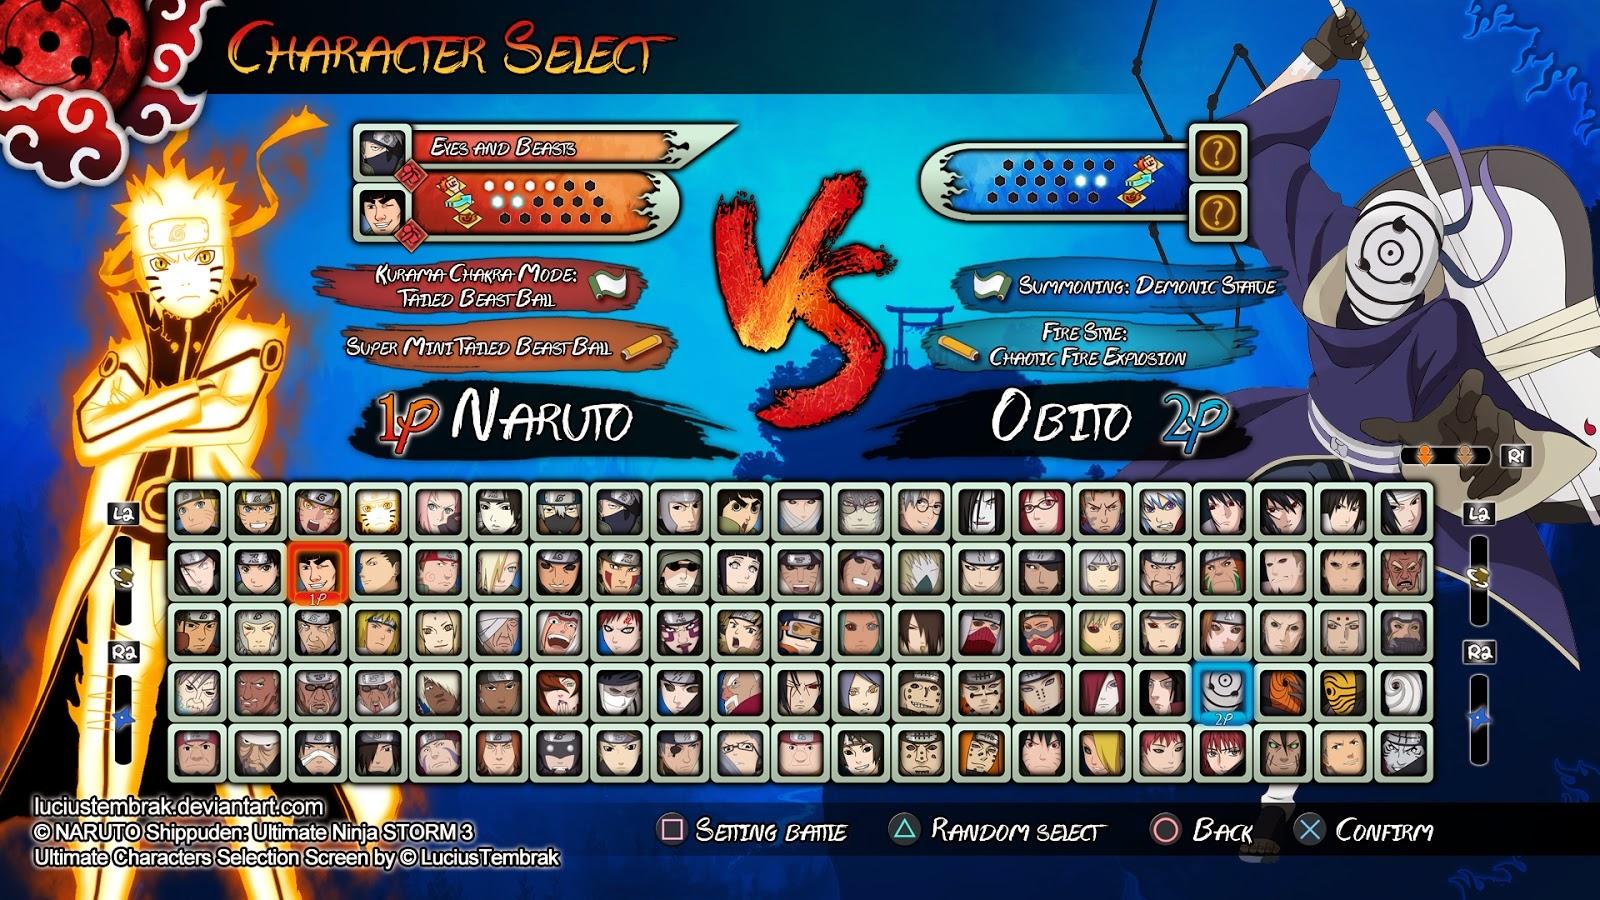 Tundhu Blog Trik Membuka Semua Karakter Game Naruto Shippuden Ultimate Ninja Storm 3 Full Burst Pc Ps3